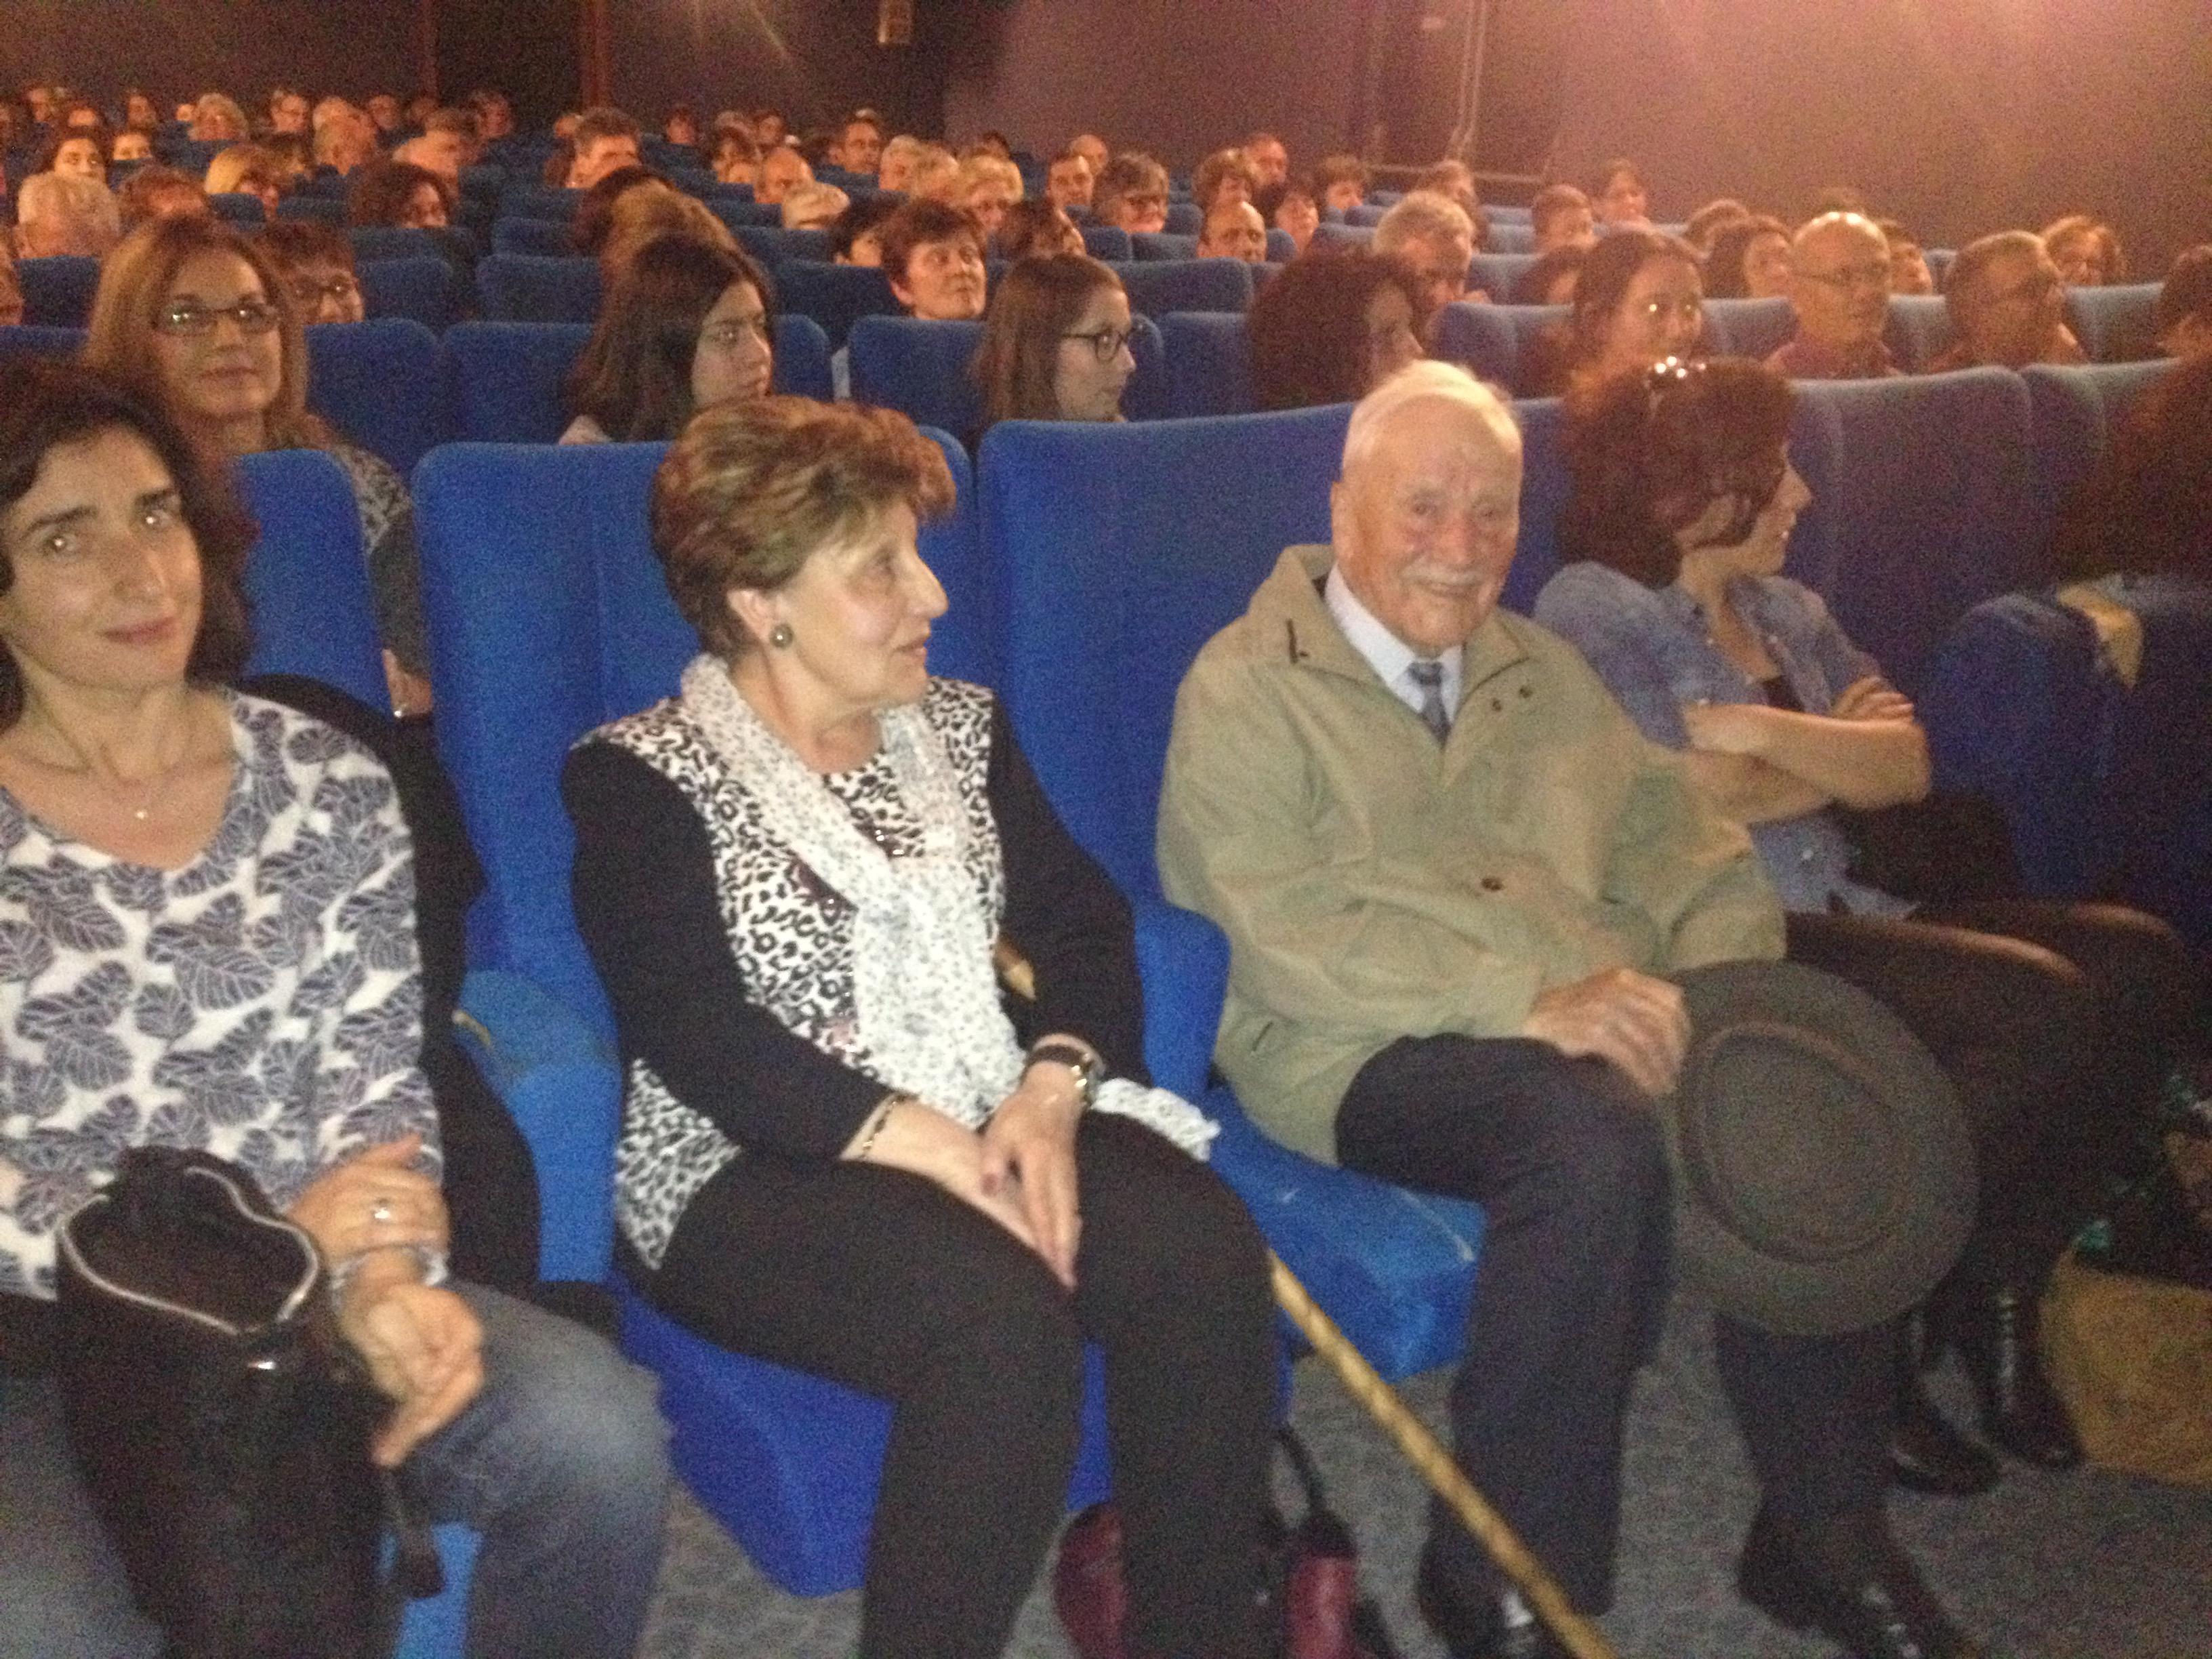 Screening of 'Emigrare: changer de demeure' at Cinema Le Concorde, Mitry-Mory, Paris, 19.05.2017 https://www.facebook.com/events/275613022900522/